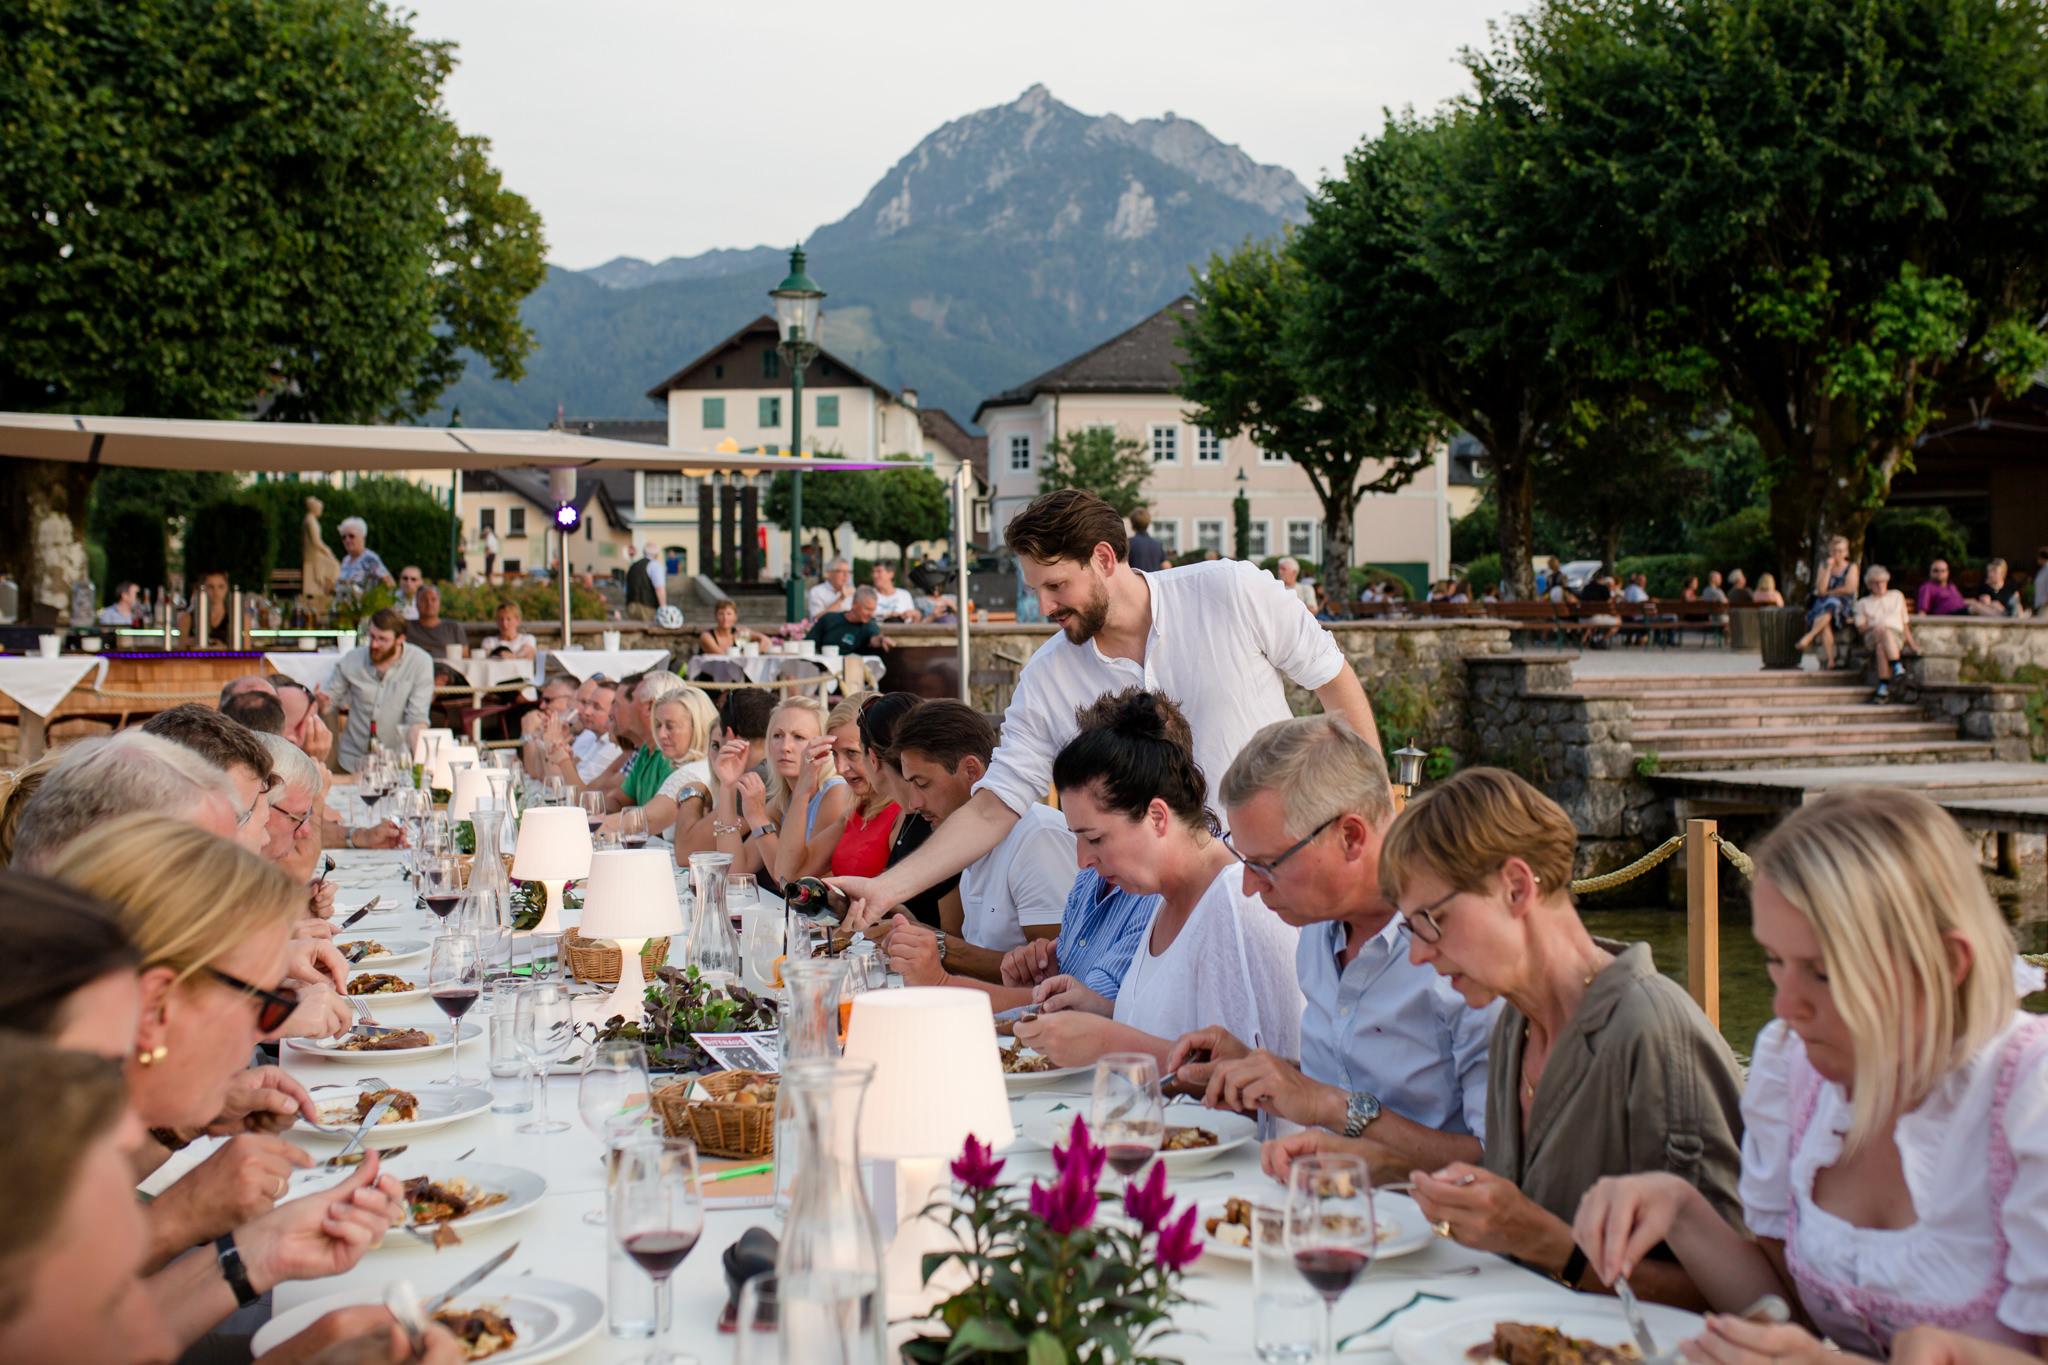 011-Wine-and-Dine-Wolfgangsee-Kirchenwirt-2019-Stefanie-Reindl-Photography-Web